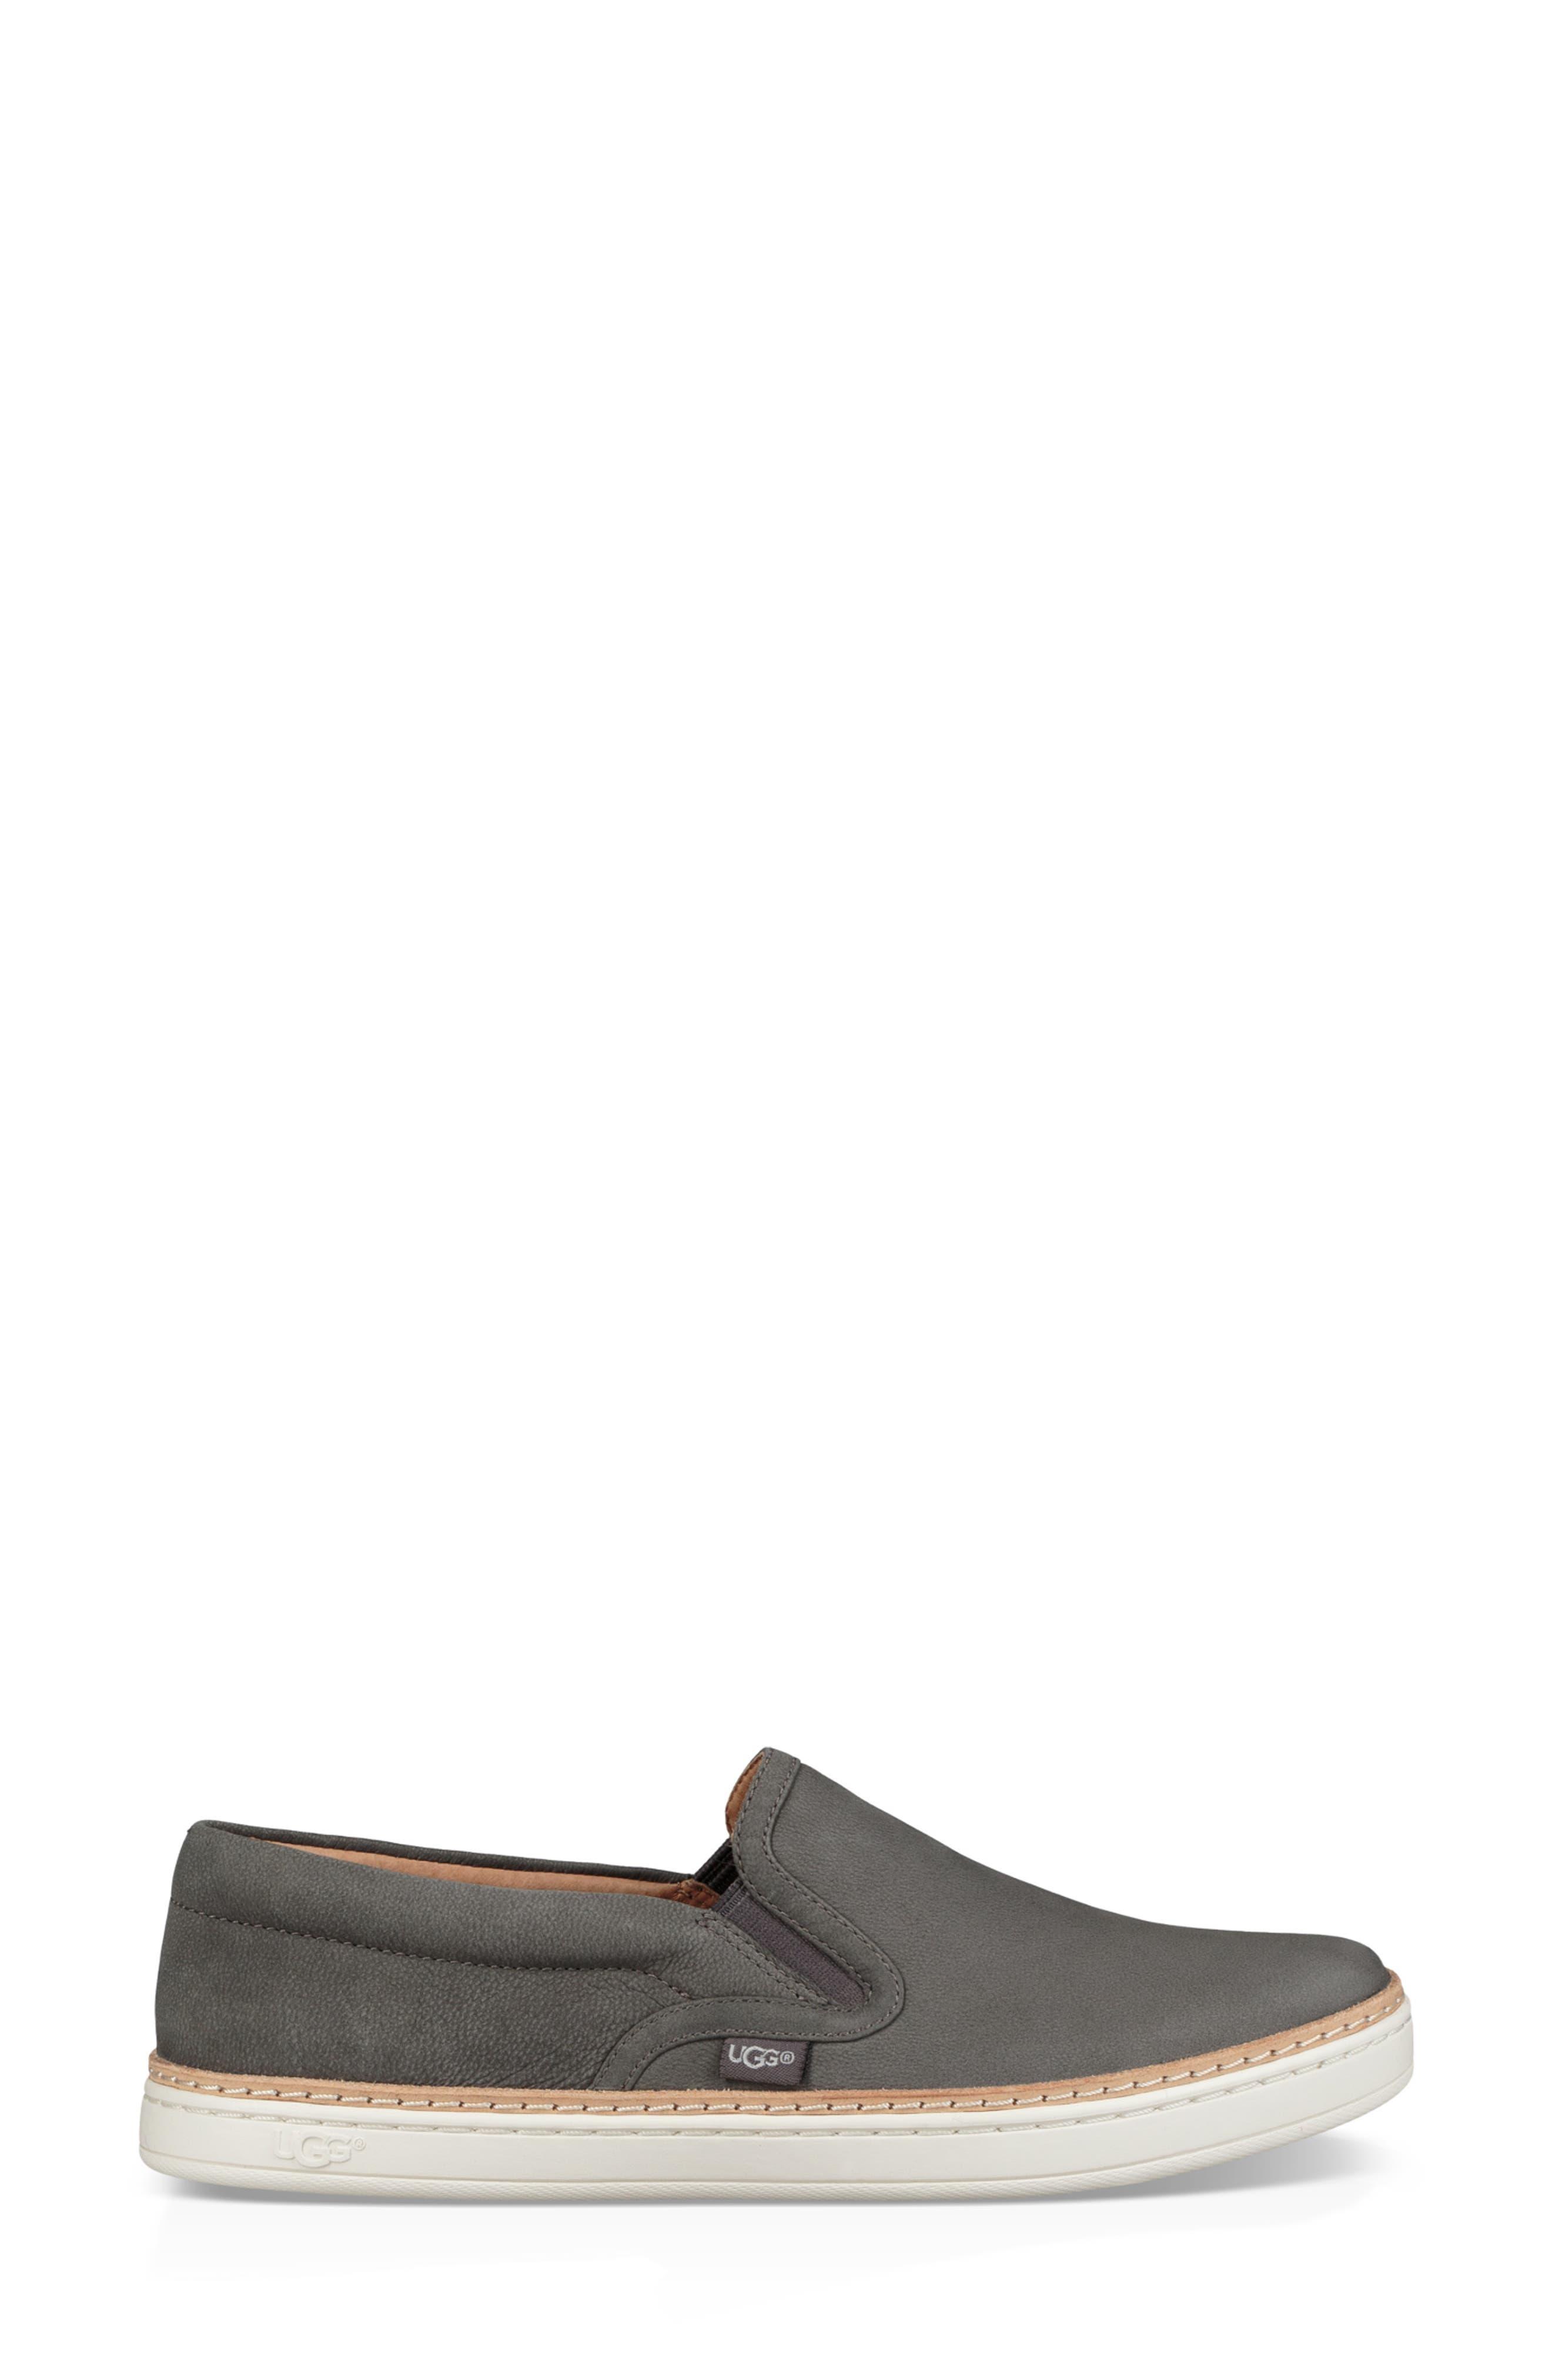 Soleda Slip-On Sneaker,                             Alternate thumbnail 3, color,                             CHARCOAL LEATHER